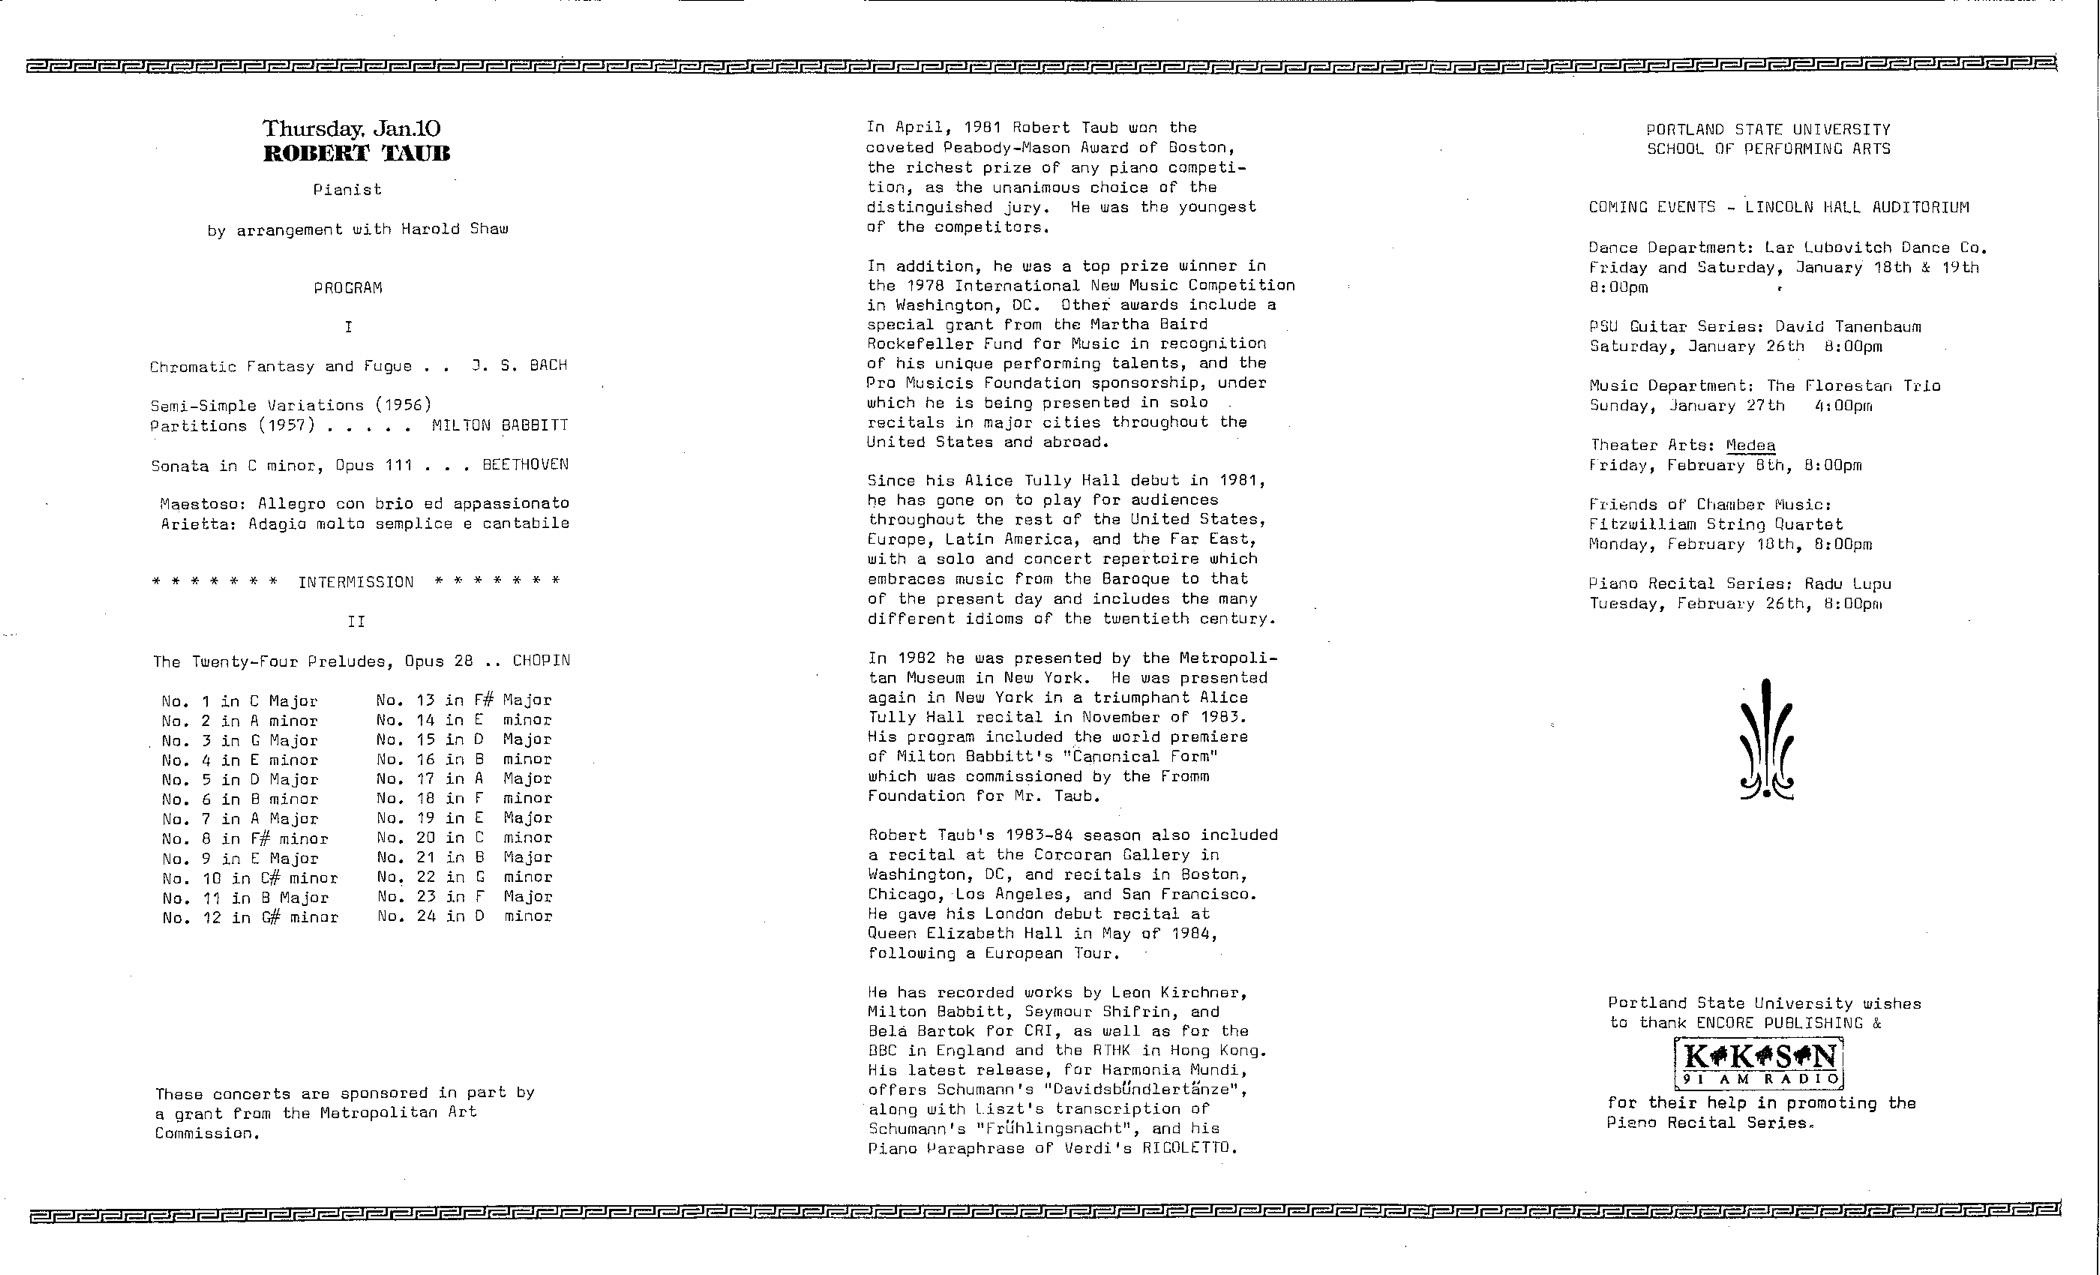 Taub84-85_Program2.jpg